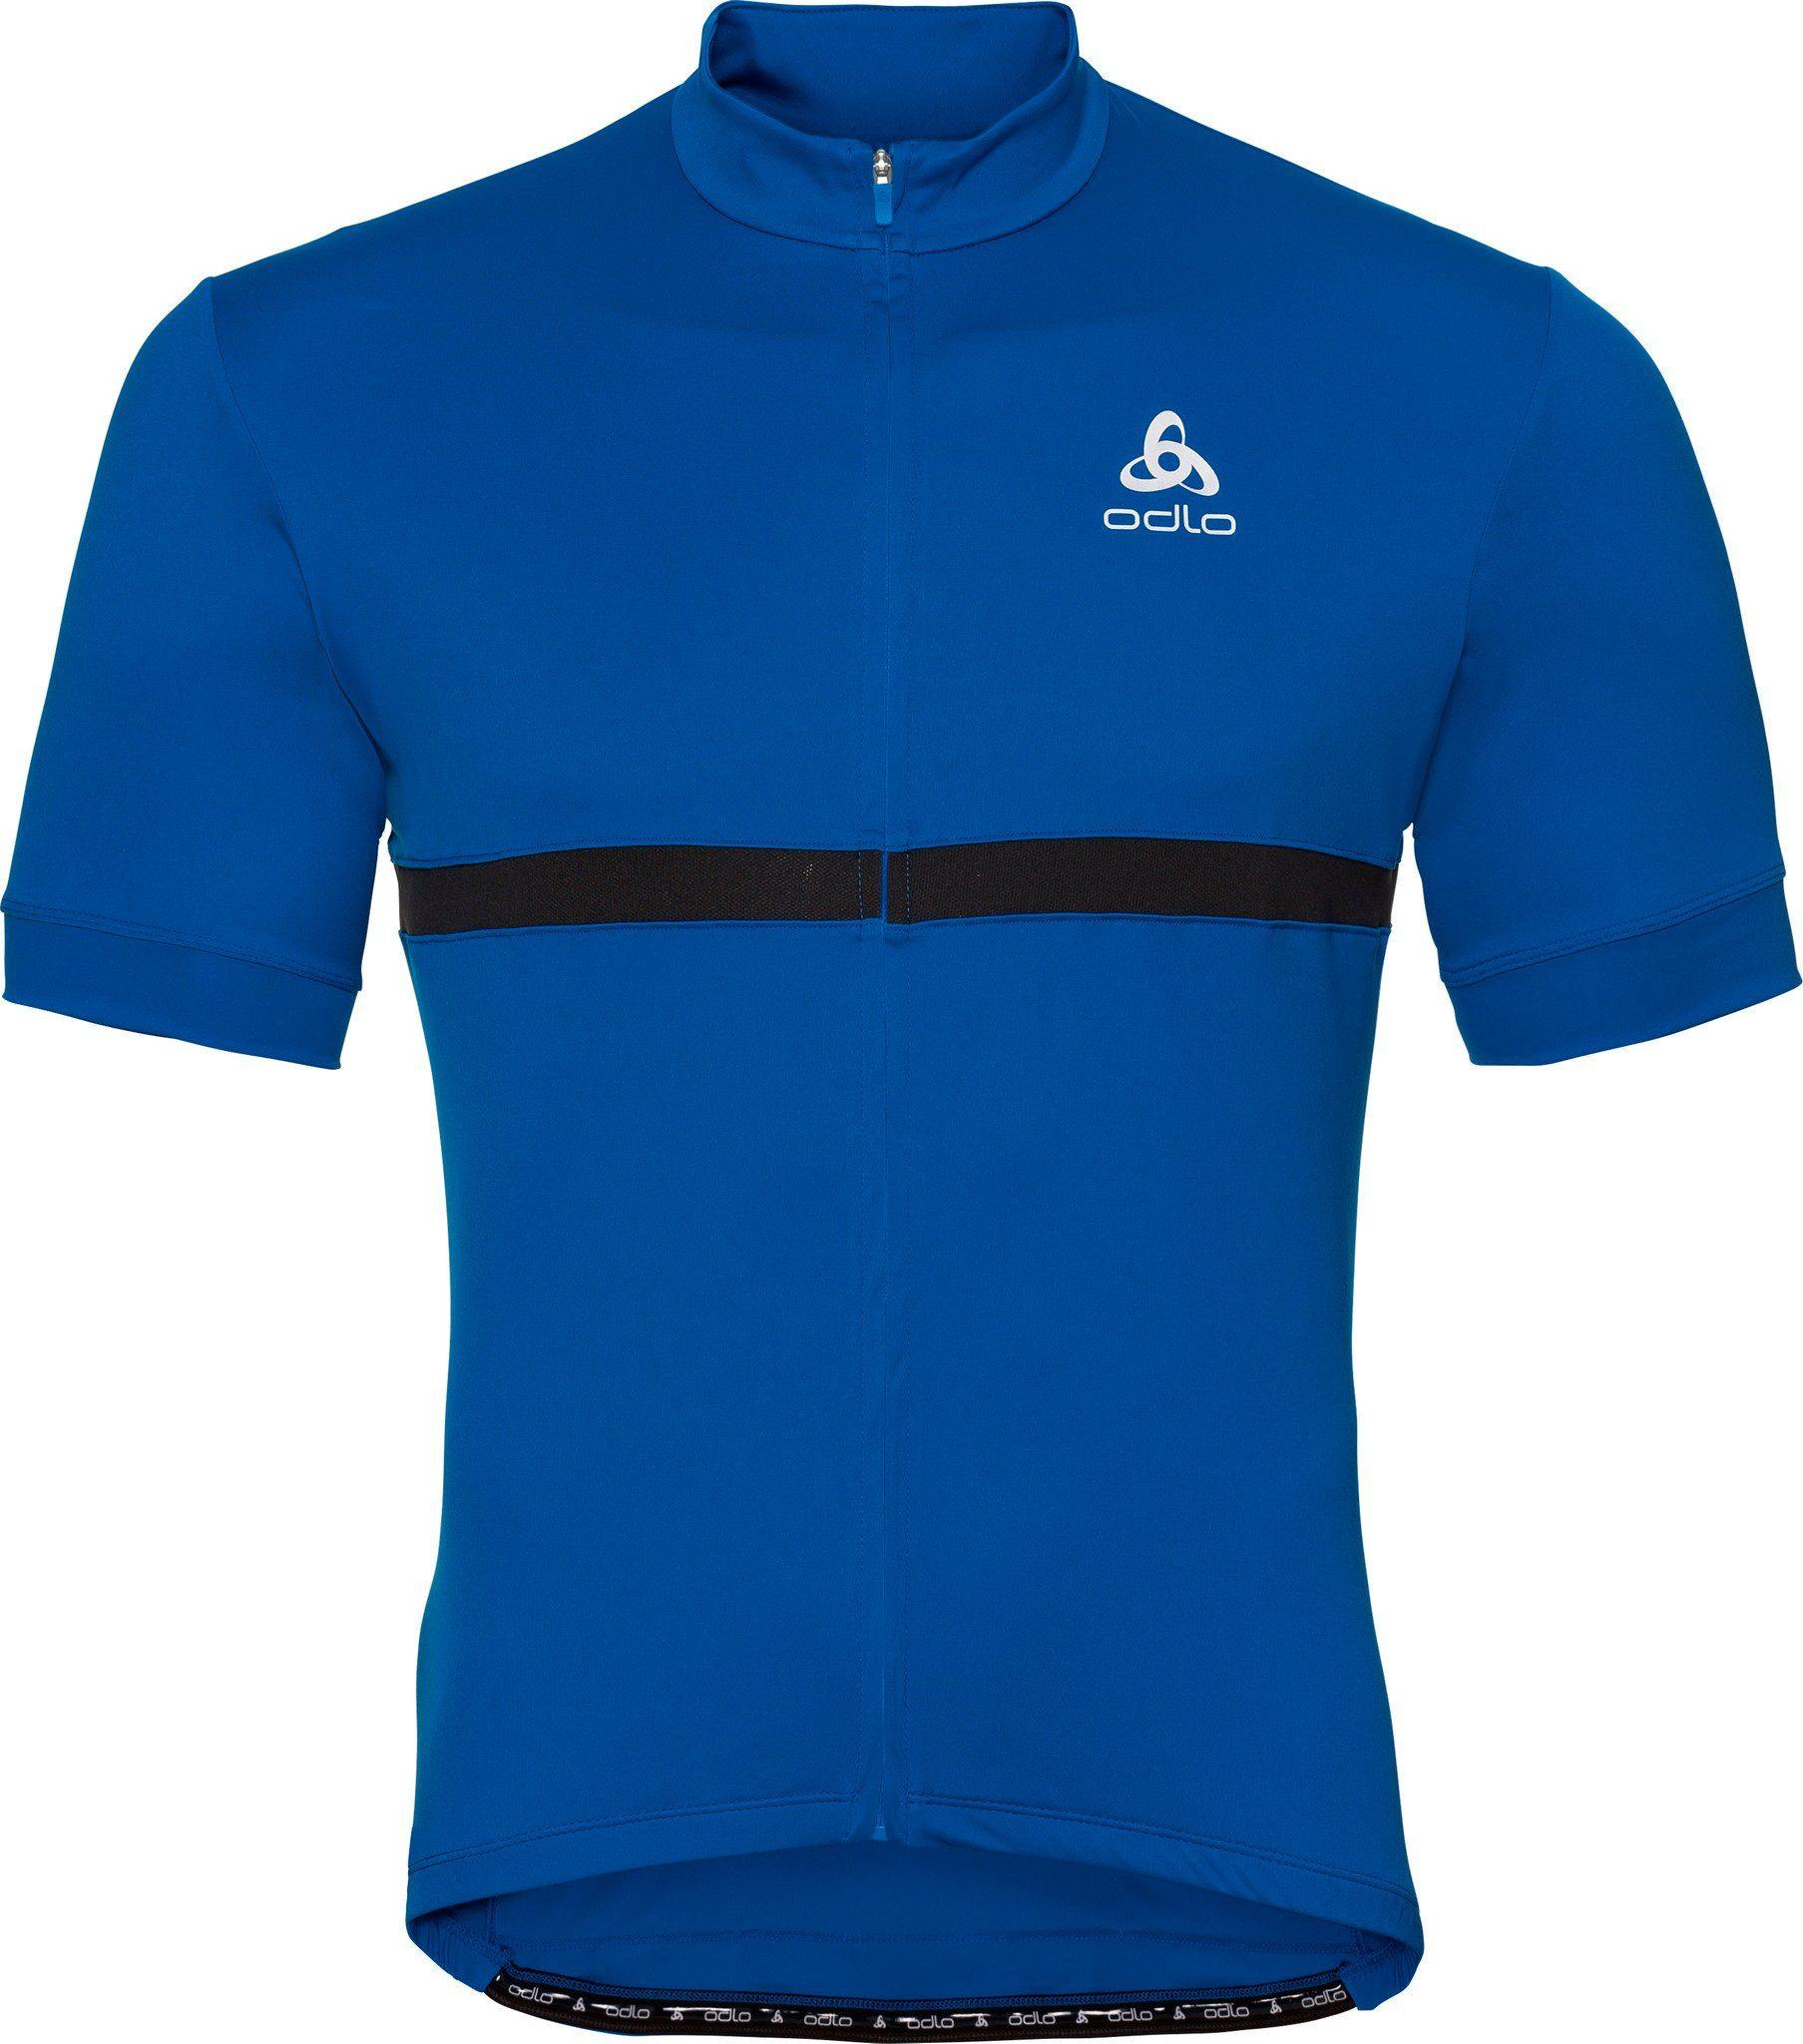 Odlo T-Shirt »Fujin Stand-Up Collar SS Full Zip Shirt Men«